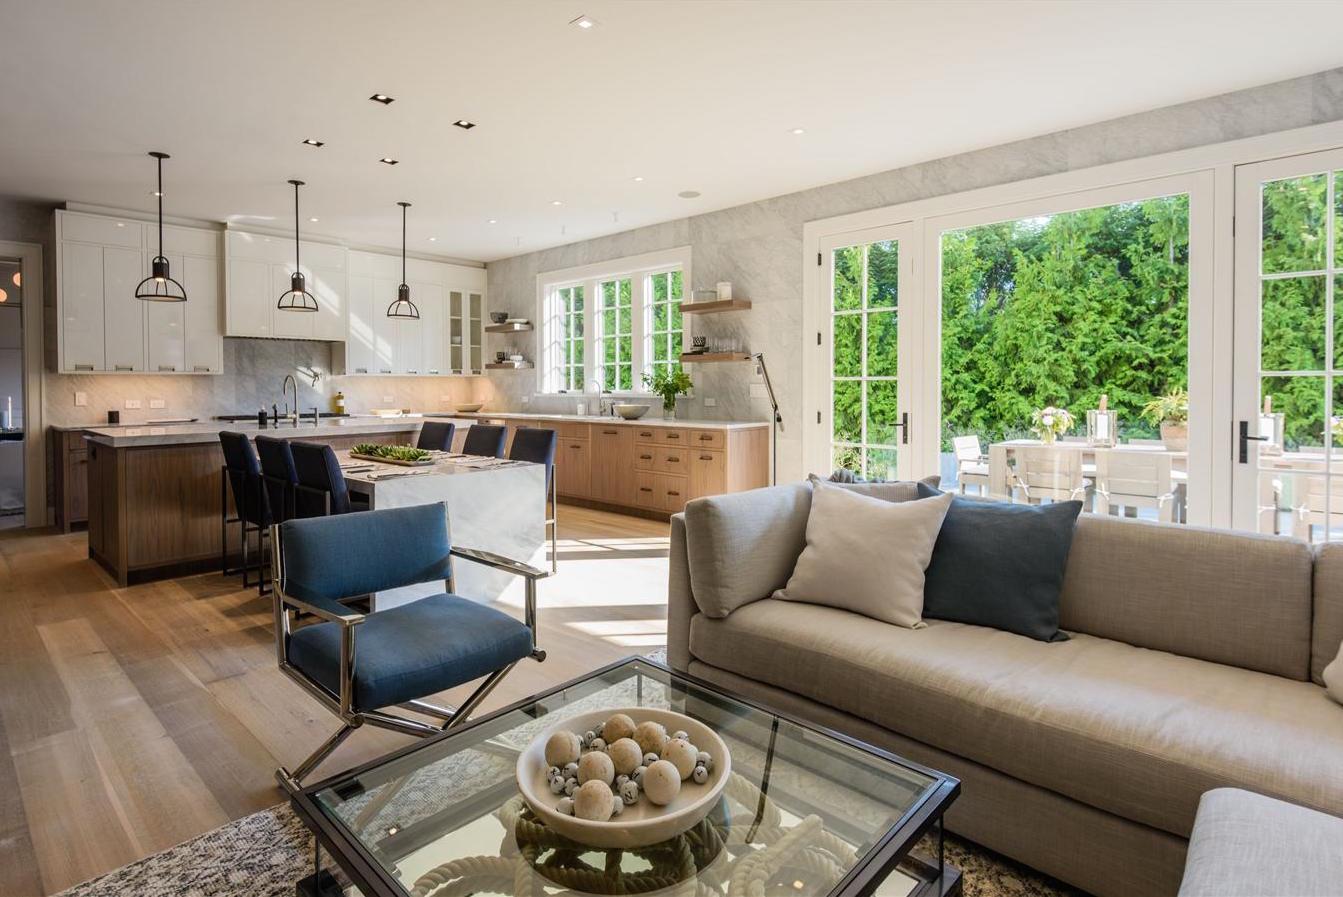 Alicia_murphy_Hamptons_Interior_Design_01_54.jpg